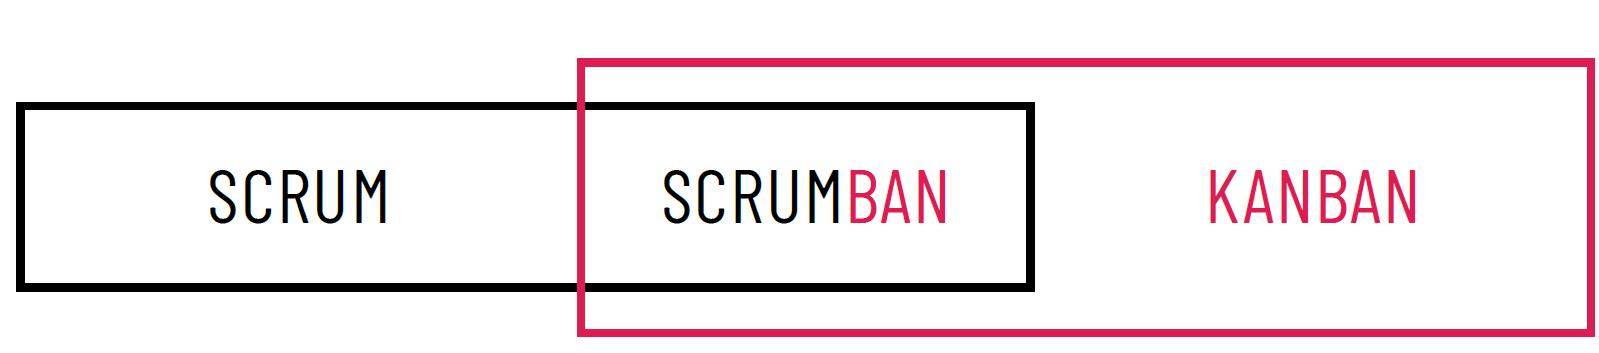 Scrumban